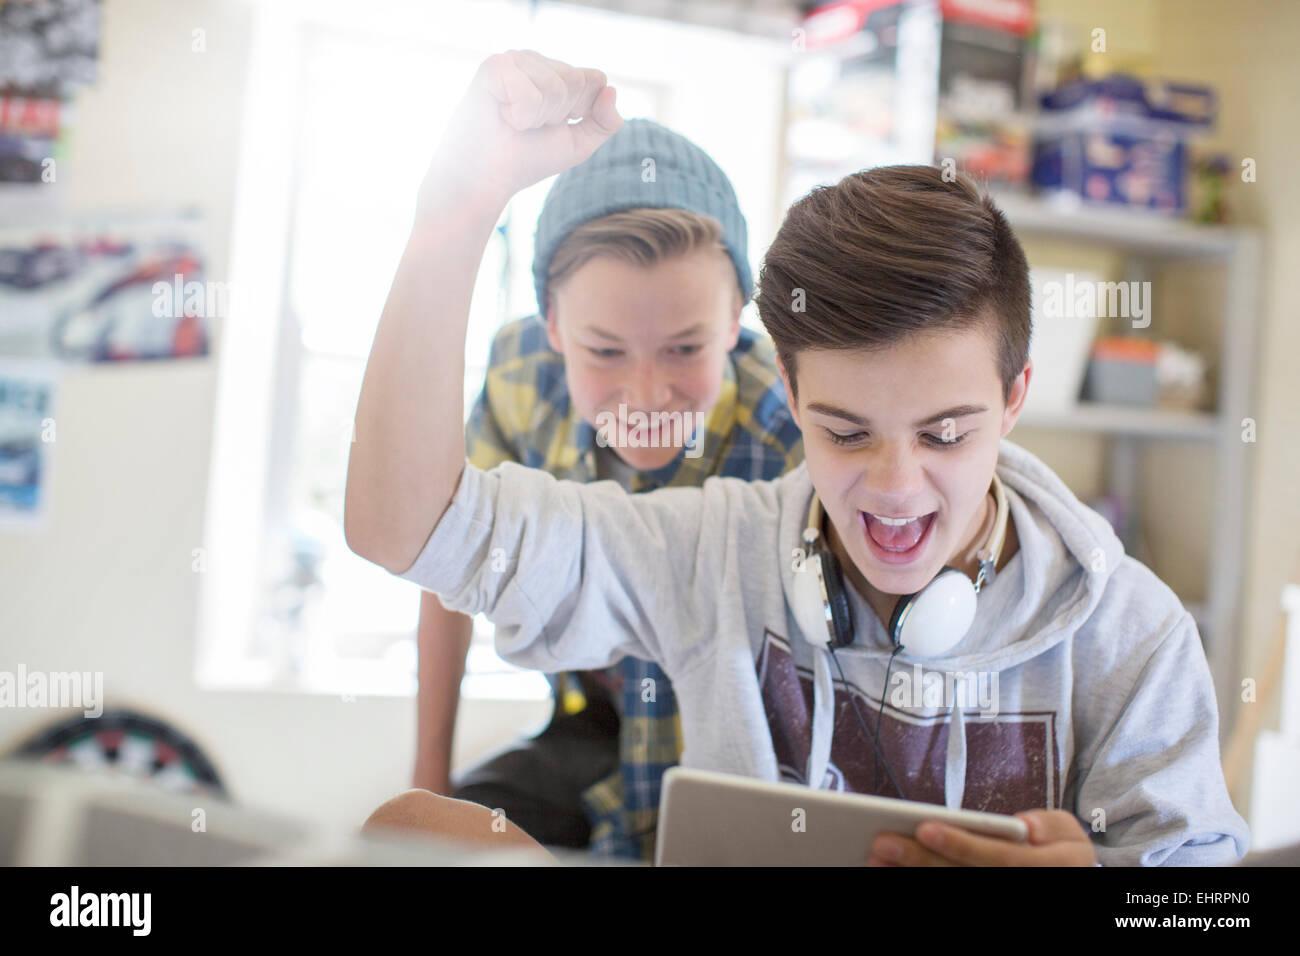 Two teenage boys having fun while using digital tablet - Stock Image